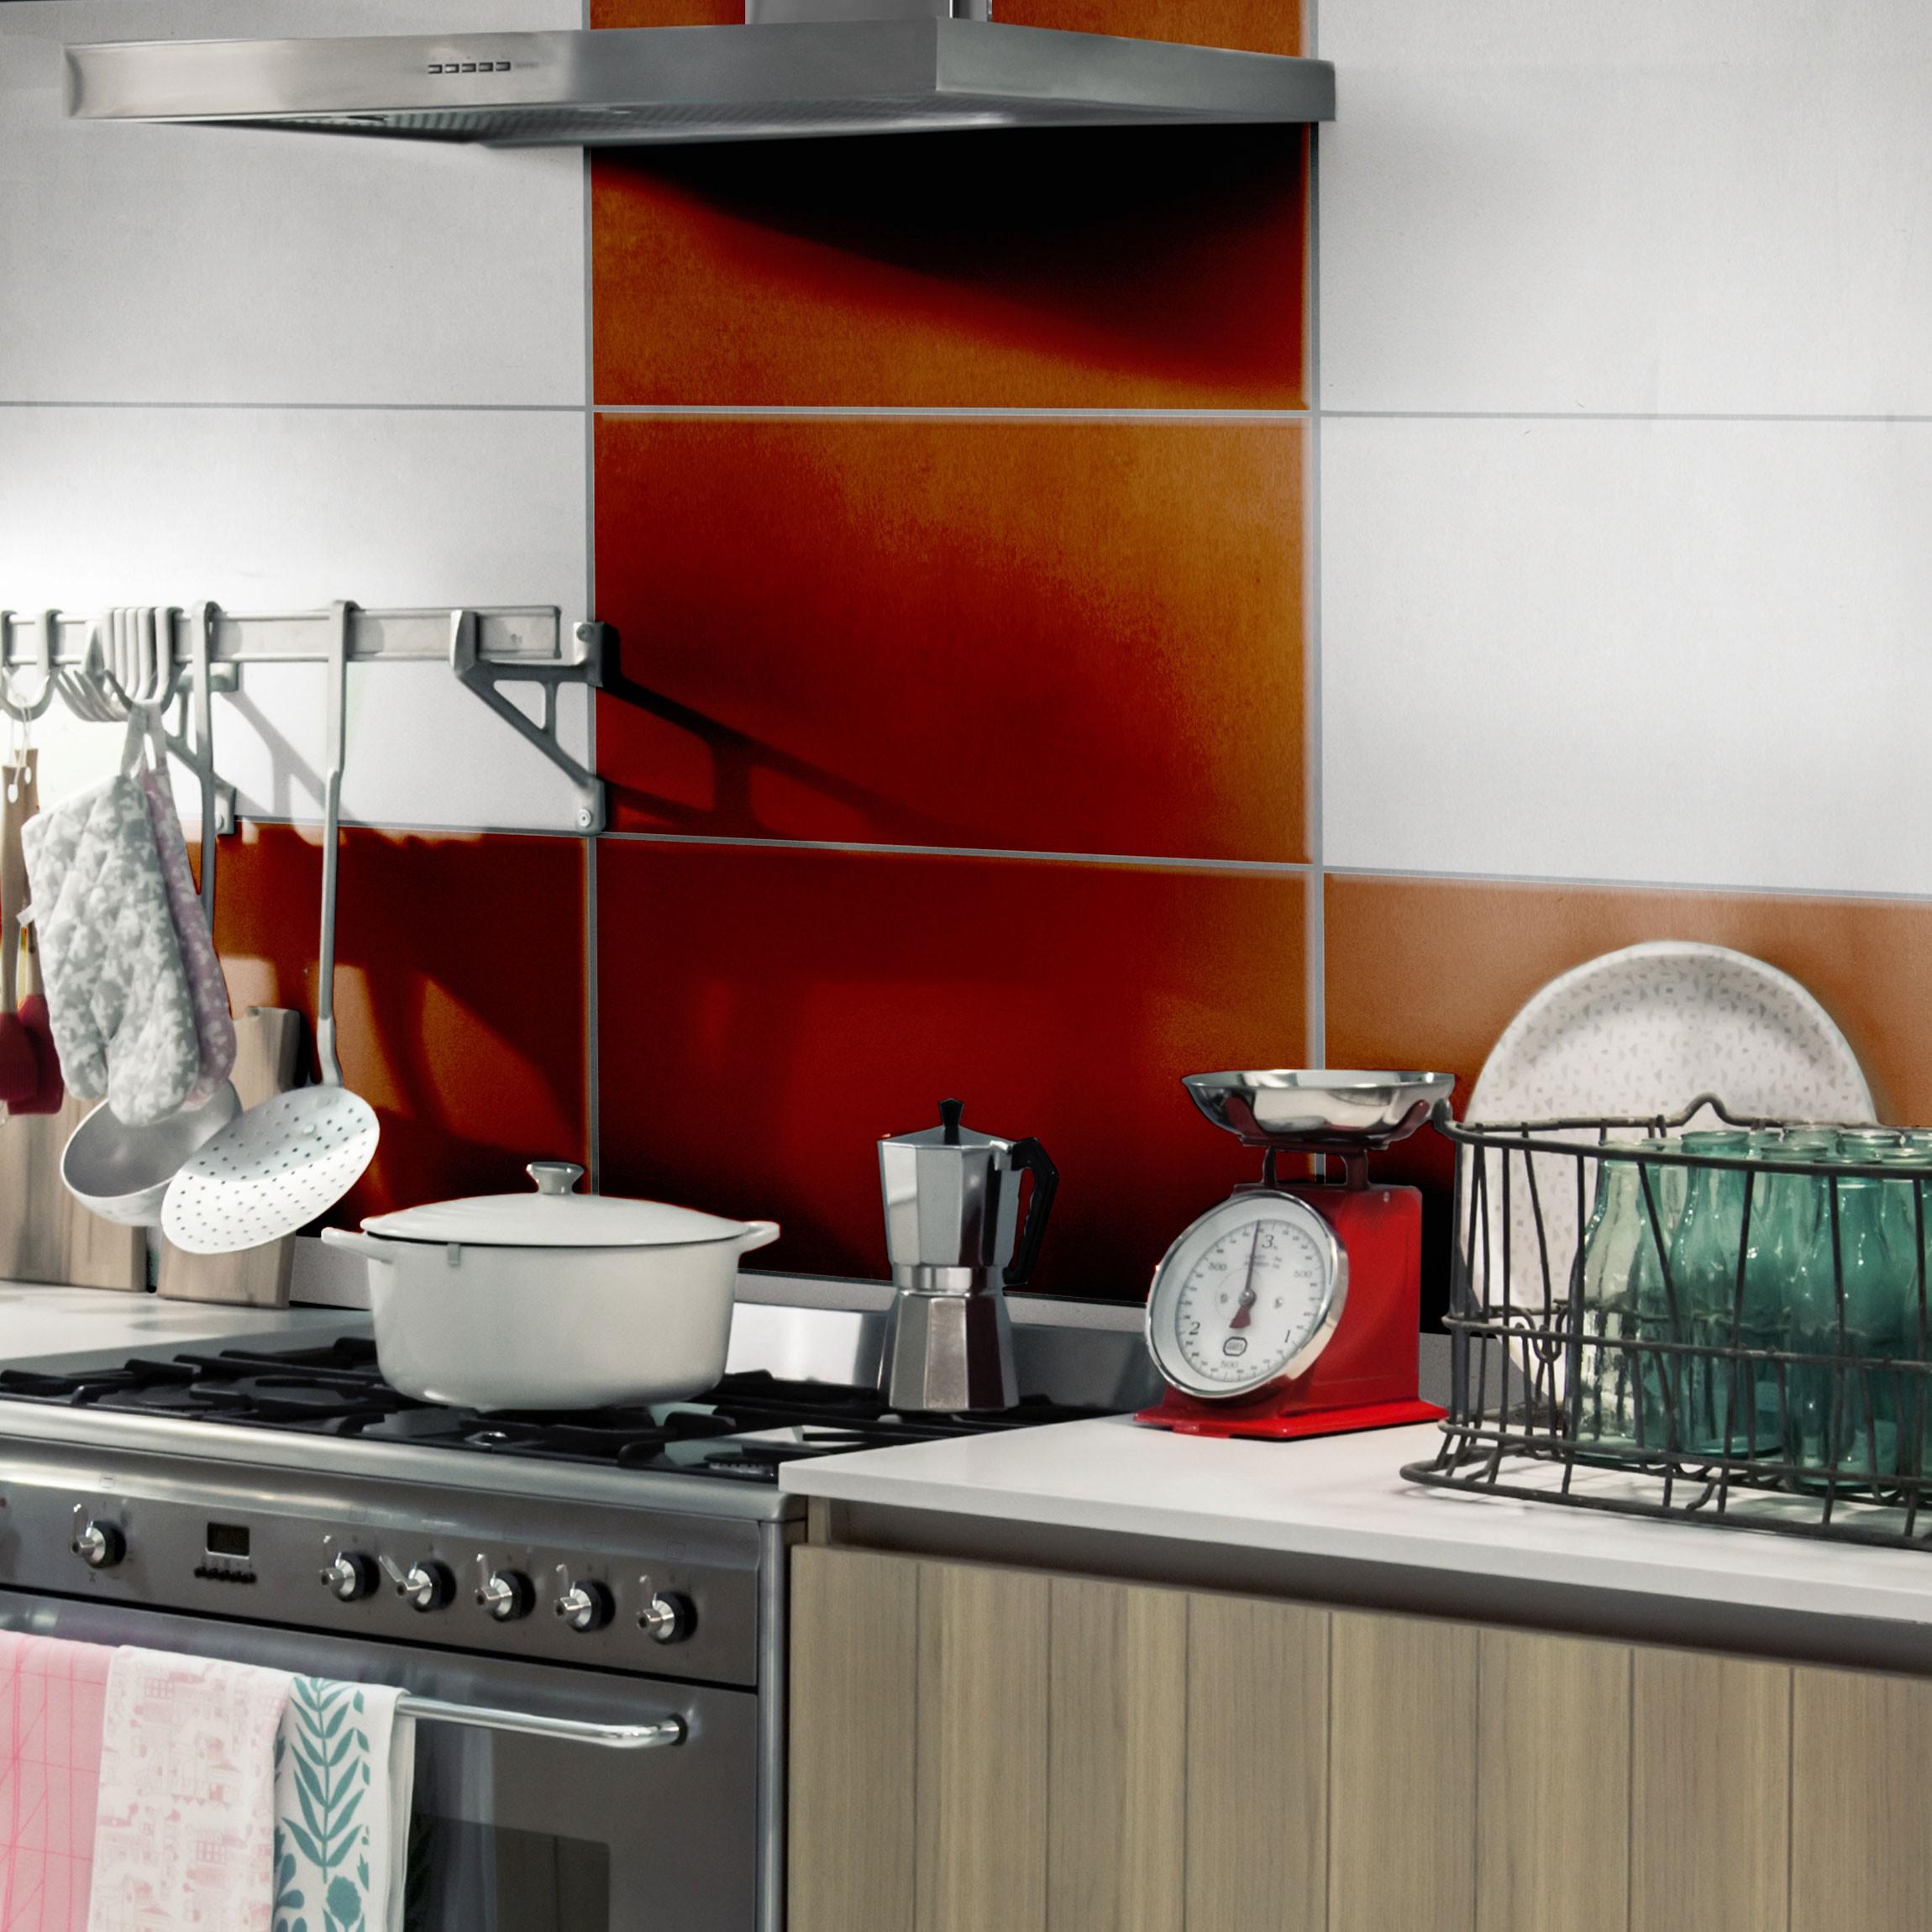 fliesenaufkleber bad k che colour chocolate 30x60 cm set braun On fliesenaufkleber küche